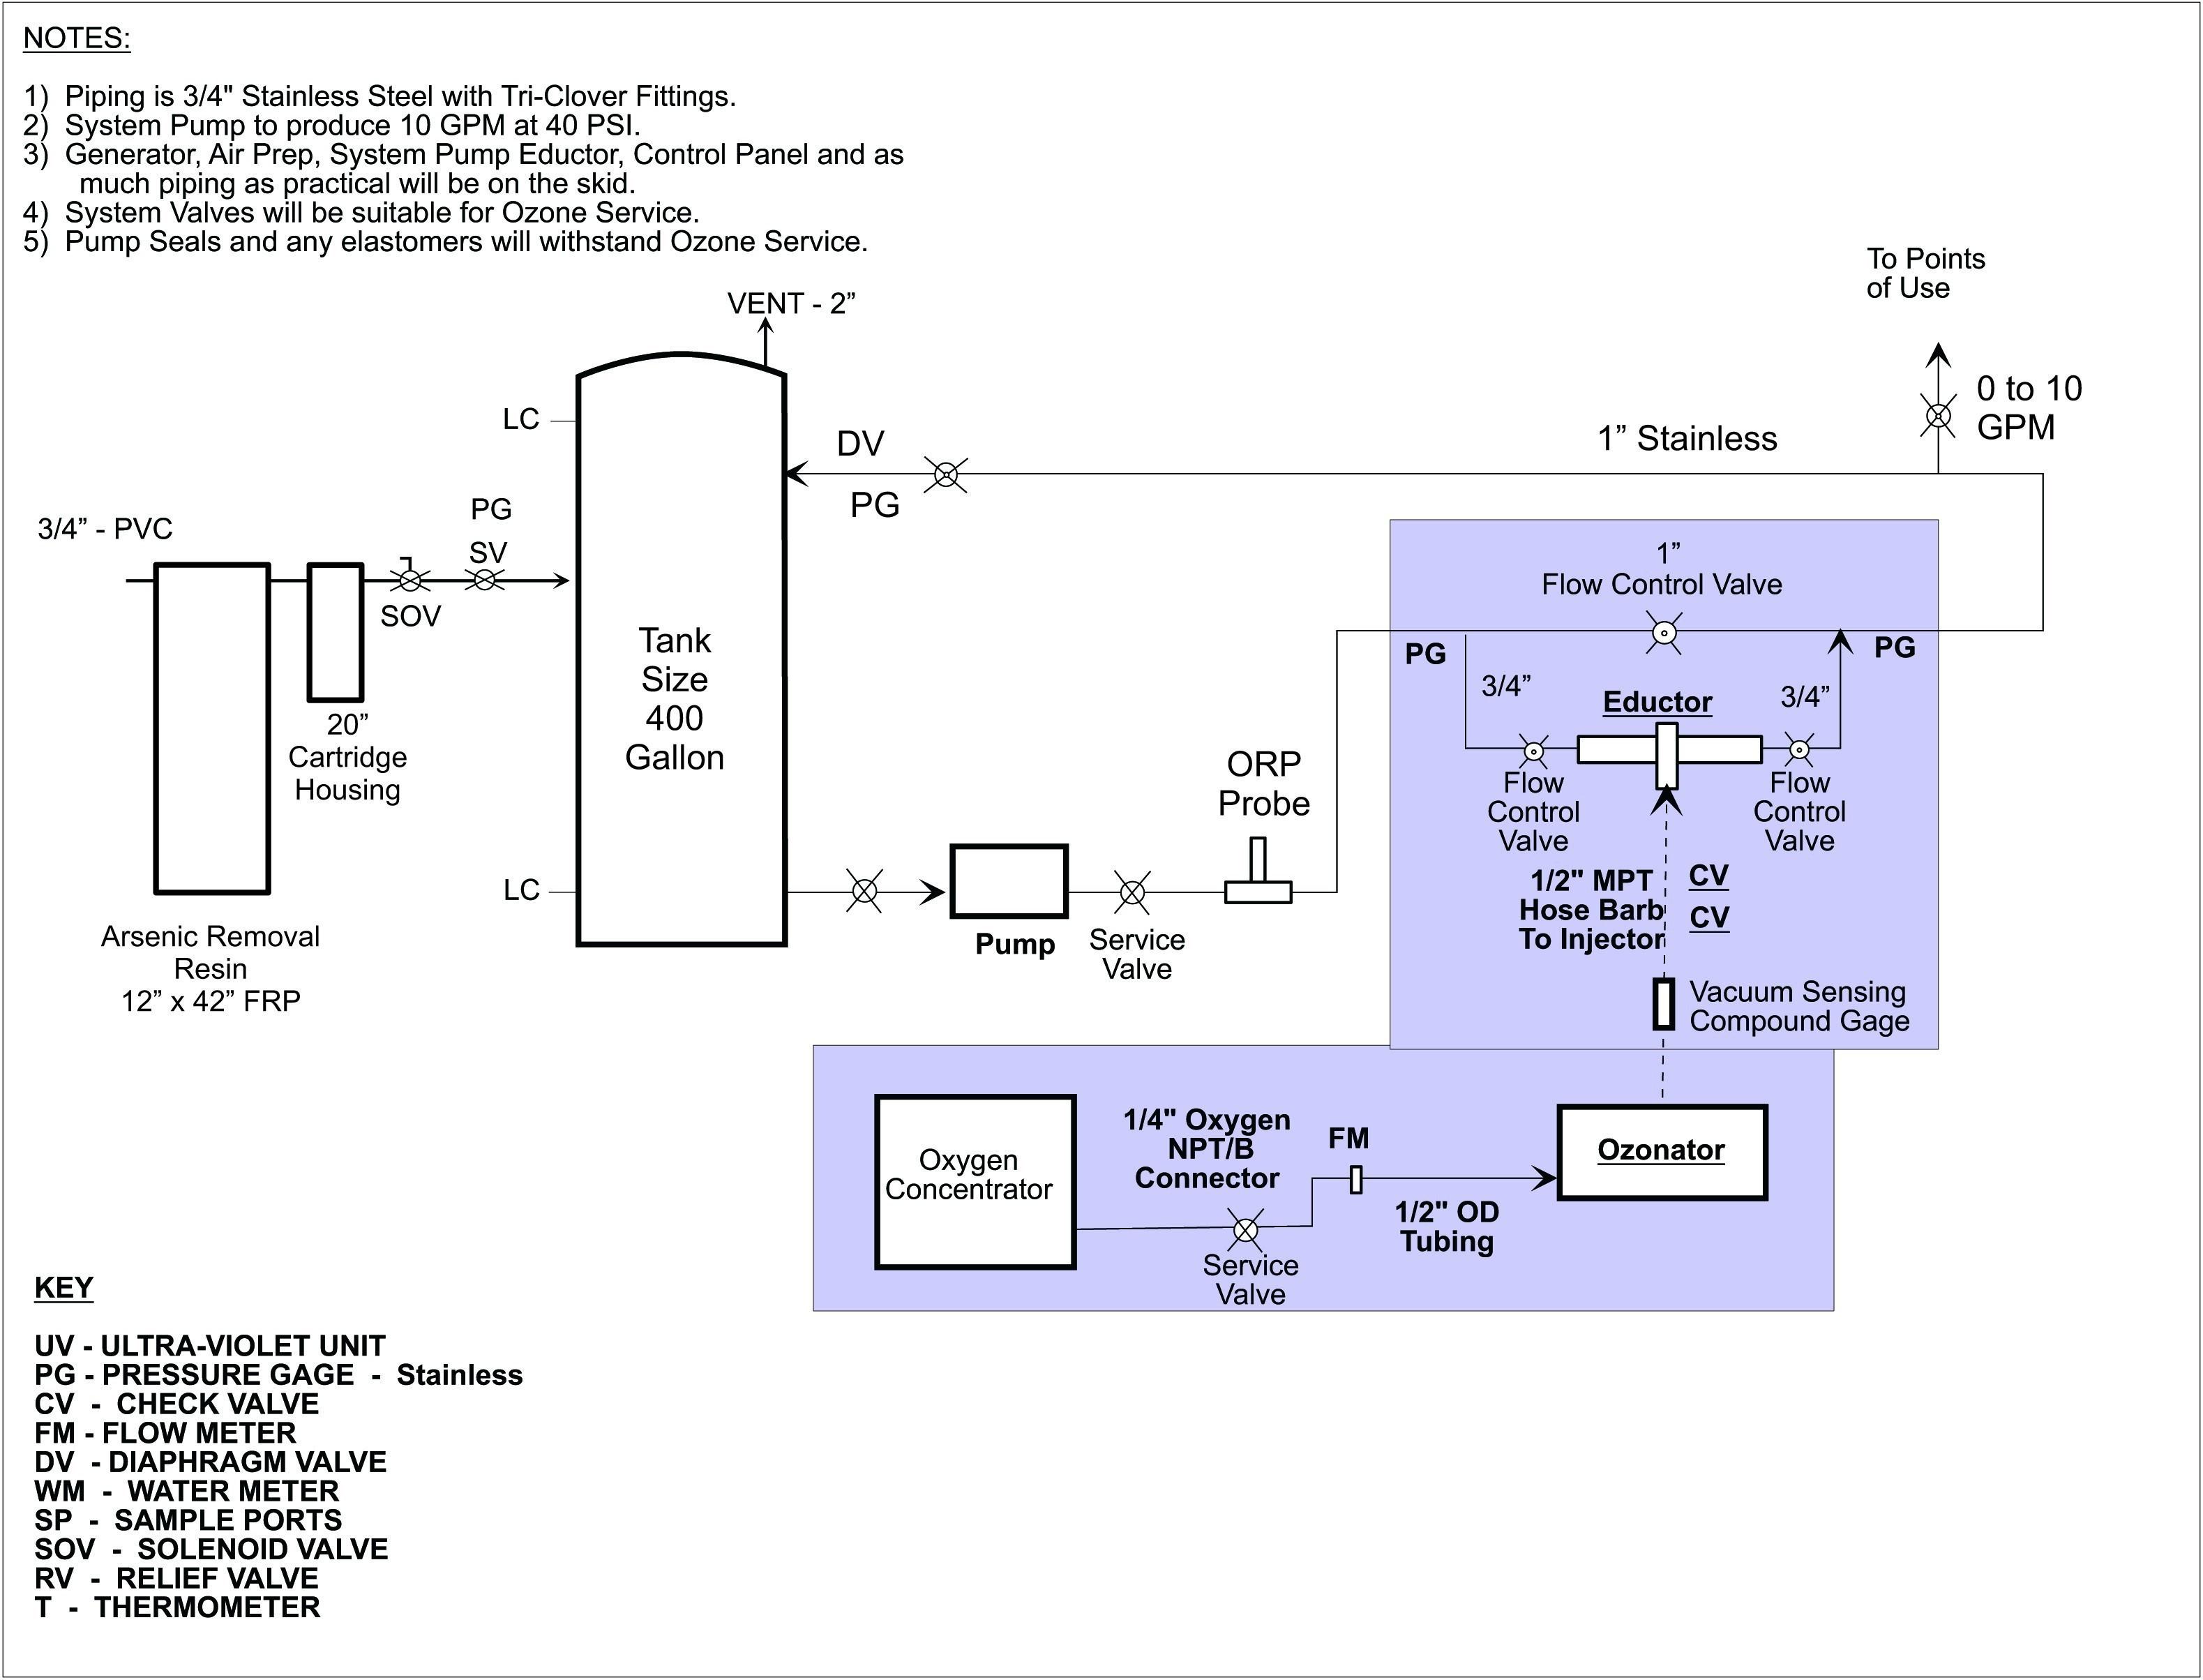 Air Brake Valve Diagram Trailer Wiring Diagram Electric Brakes Inspirational Wiring Diagram Of Air Brake Valve Diagram